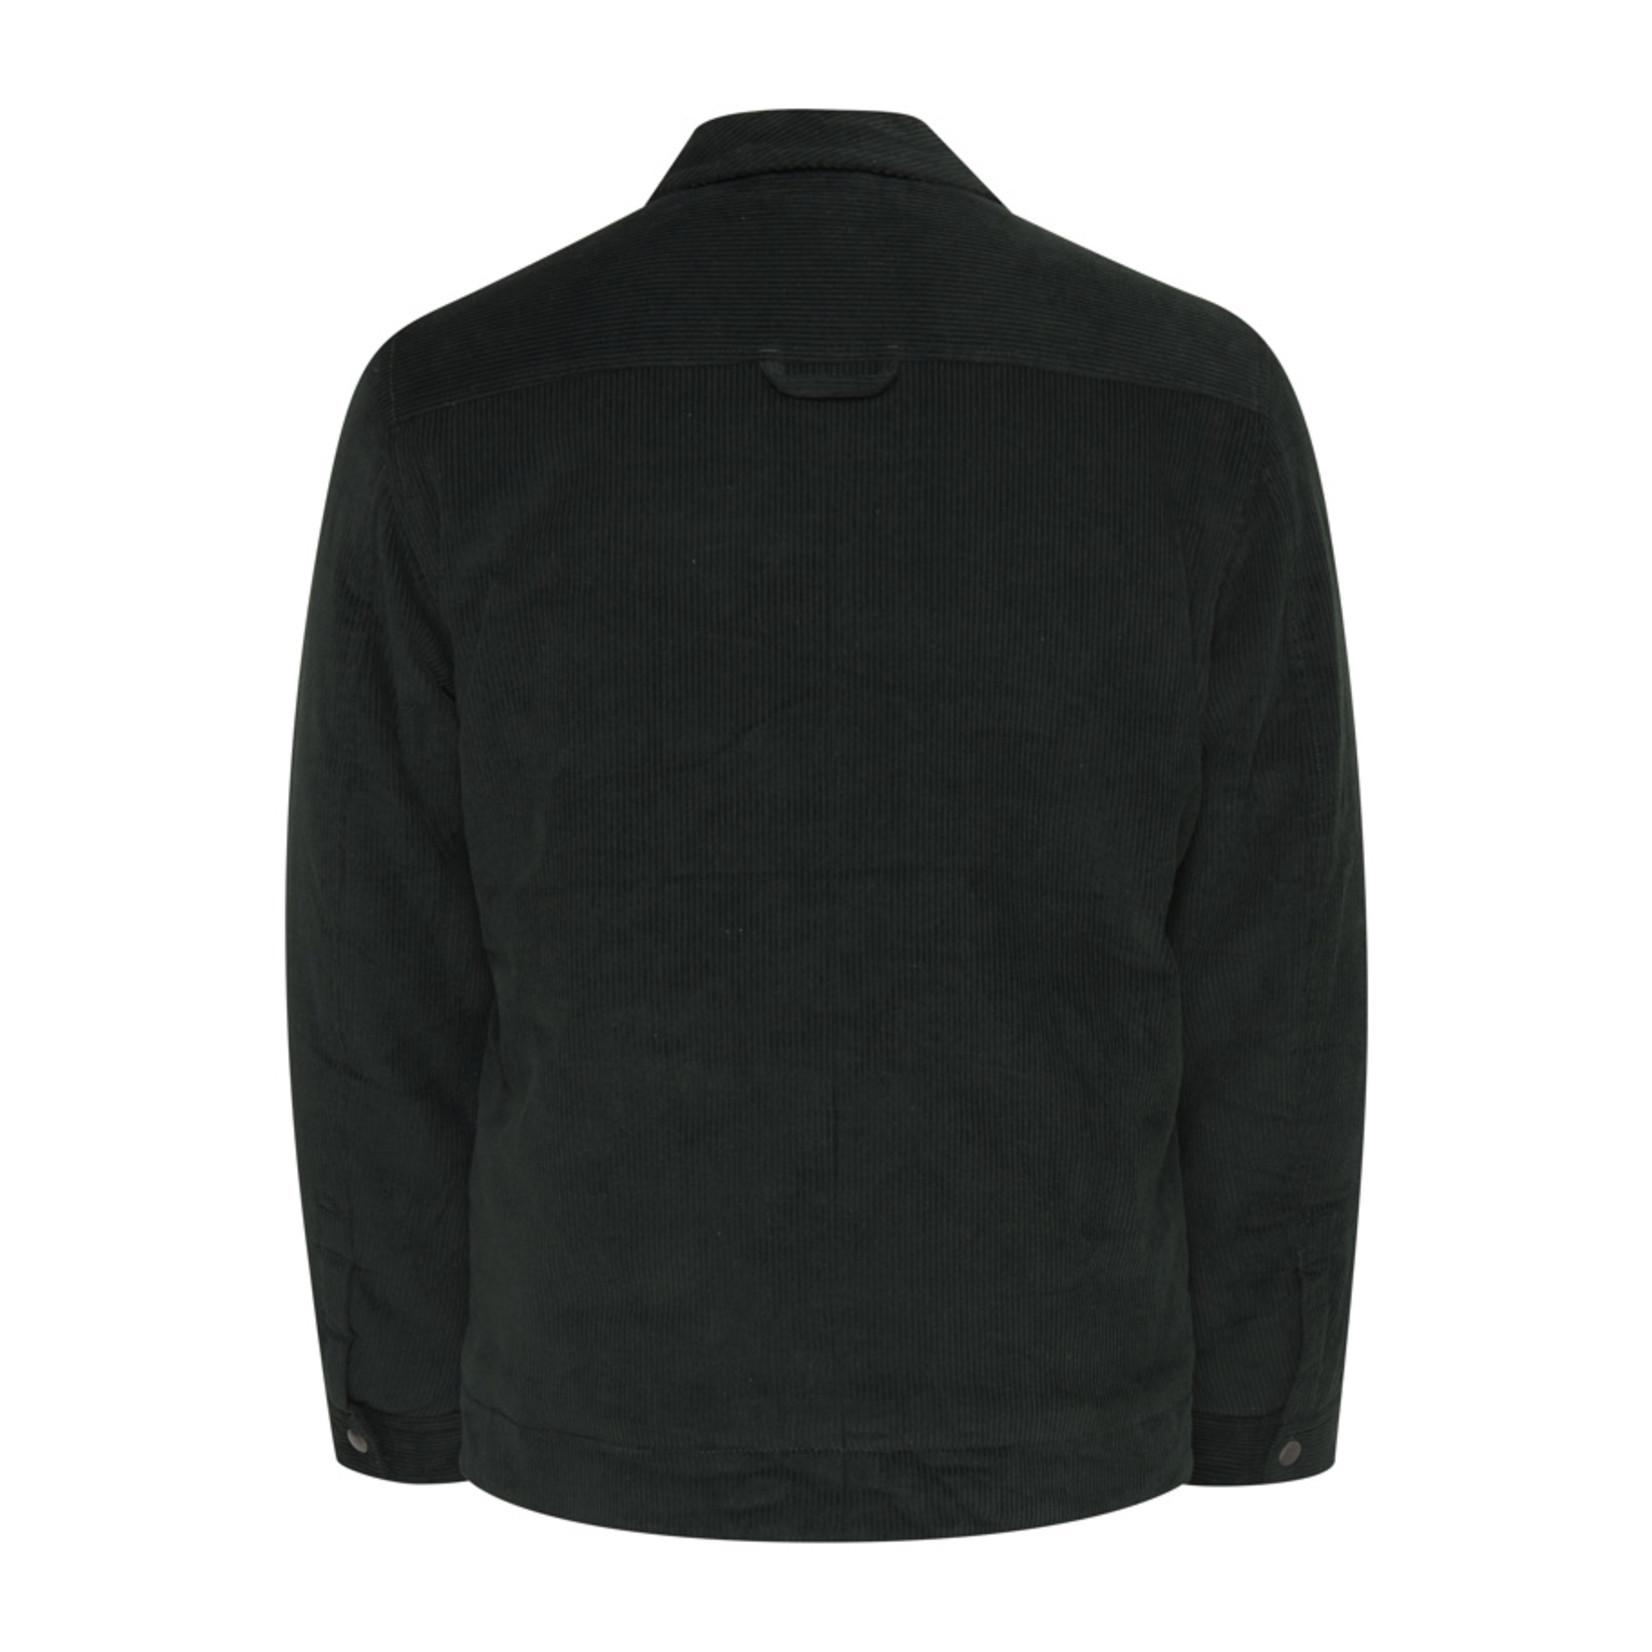 Blend Blend 20709398 Corduroy Jacket - Green Gables